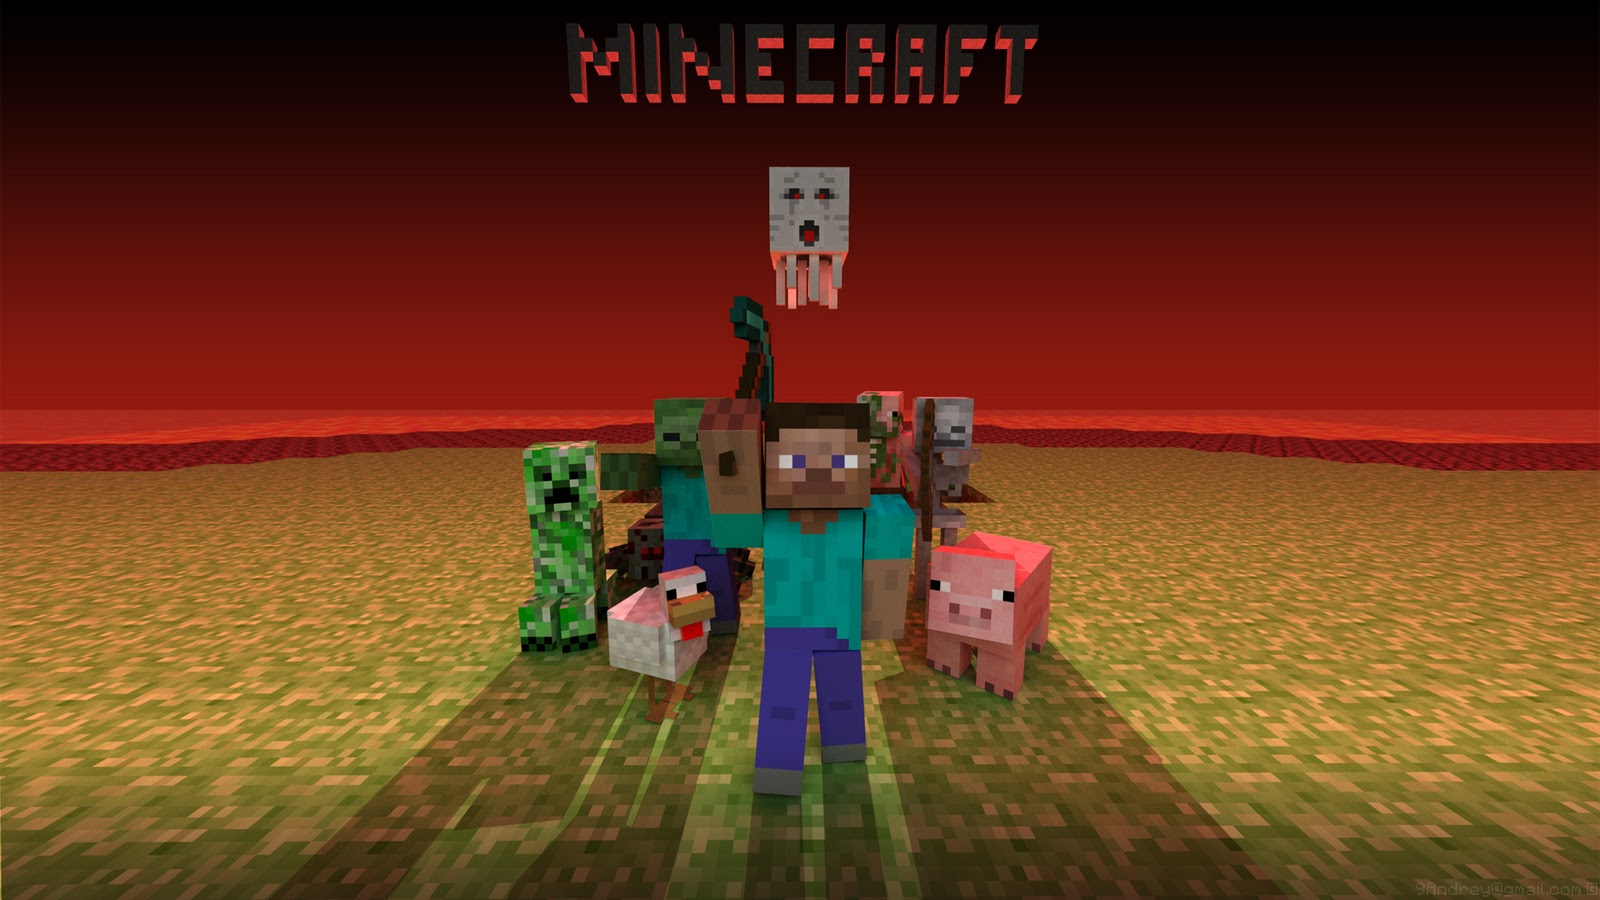 Minecraft HD Texture Pack: Minecraft Wallpaper HD